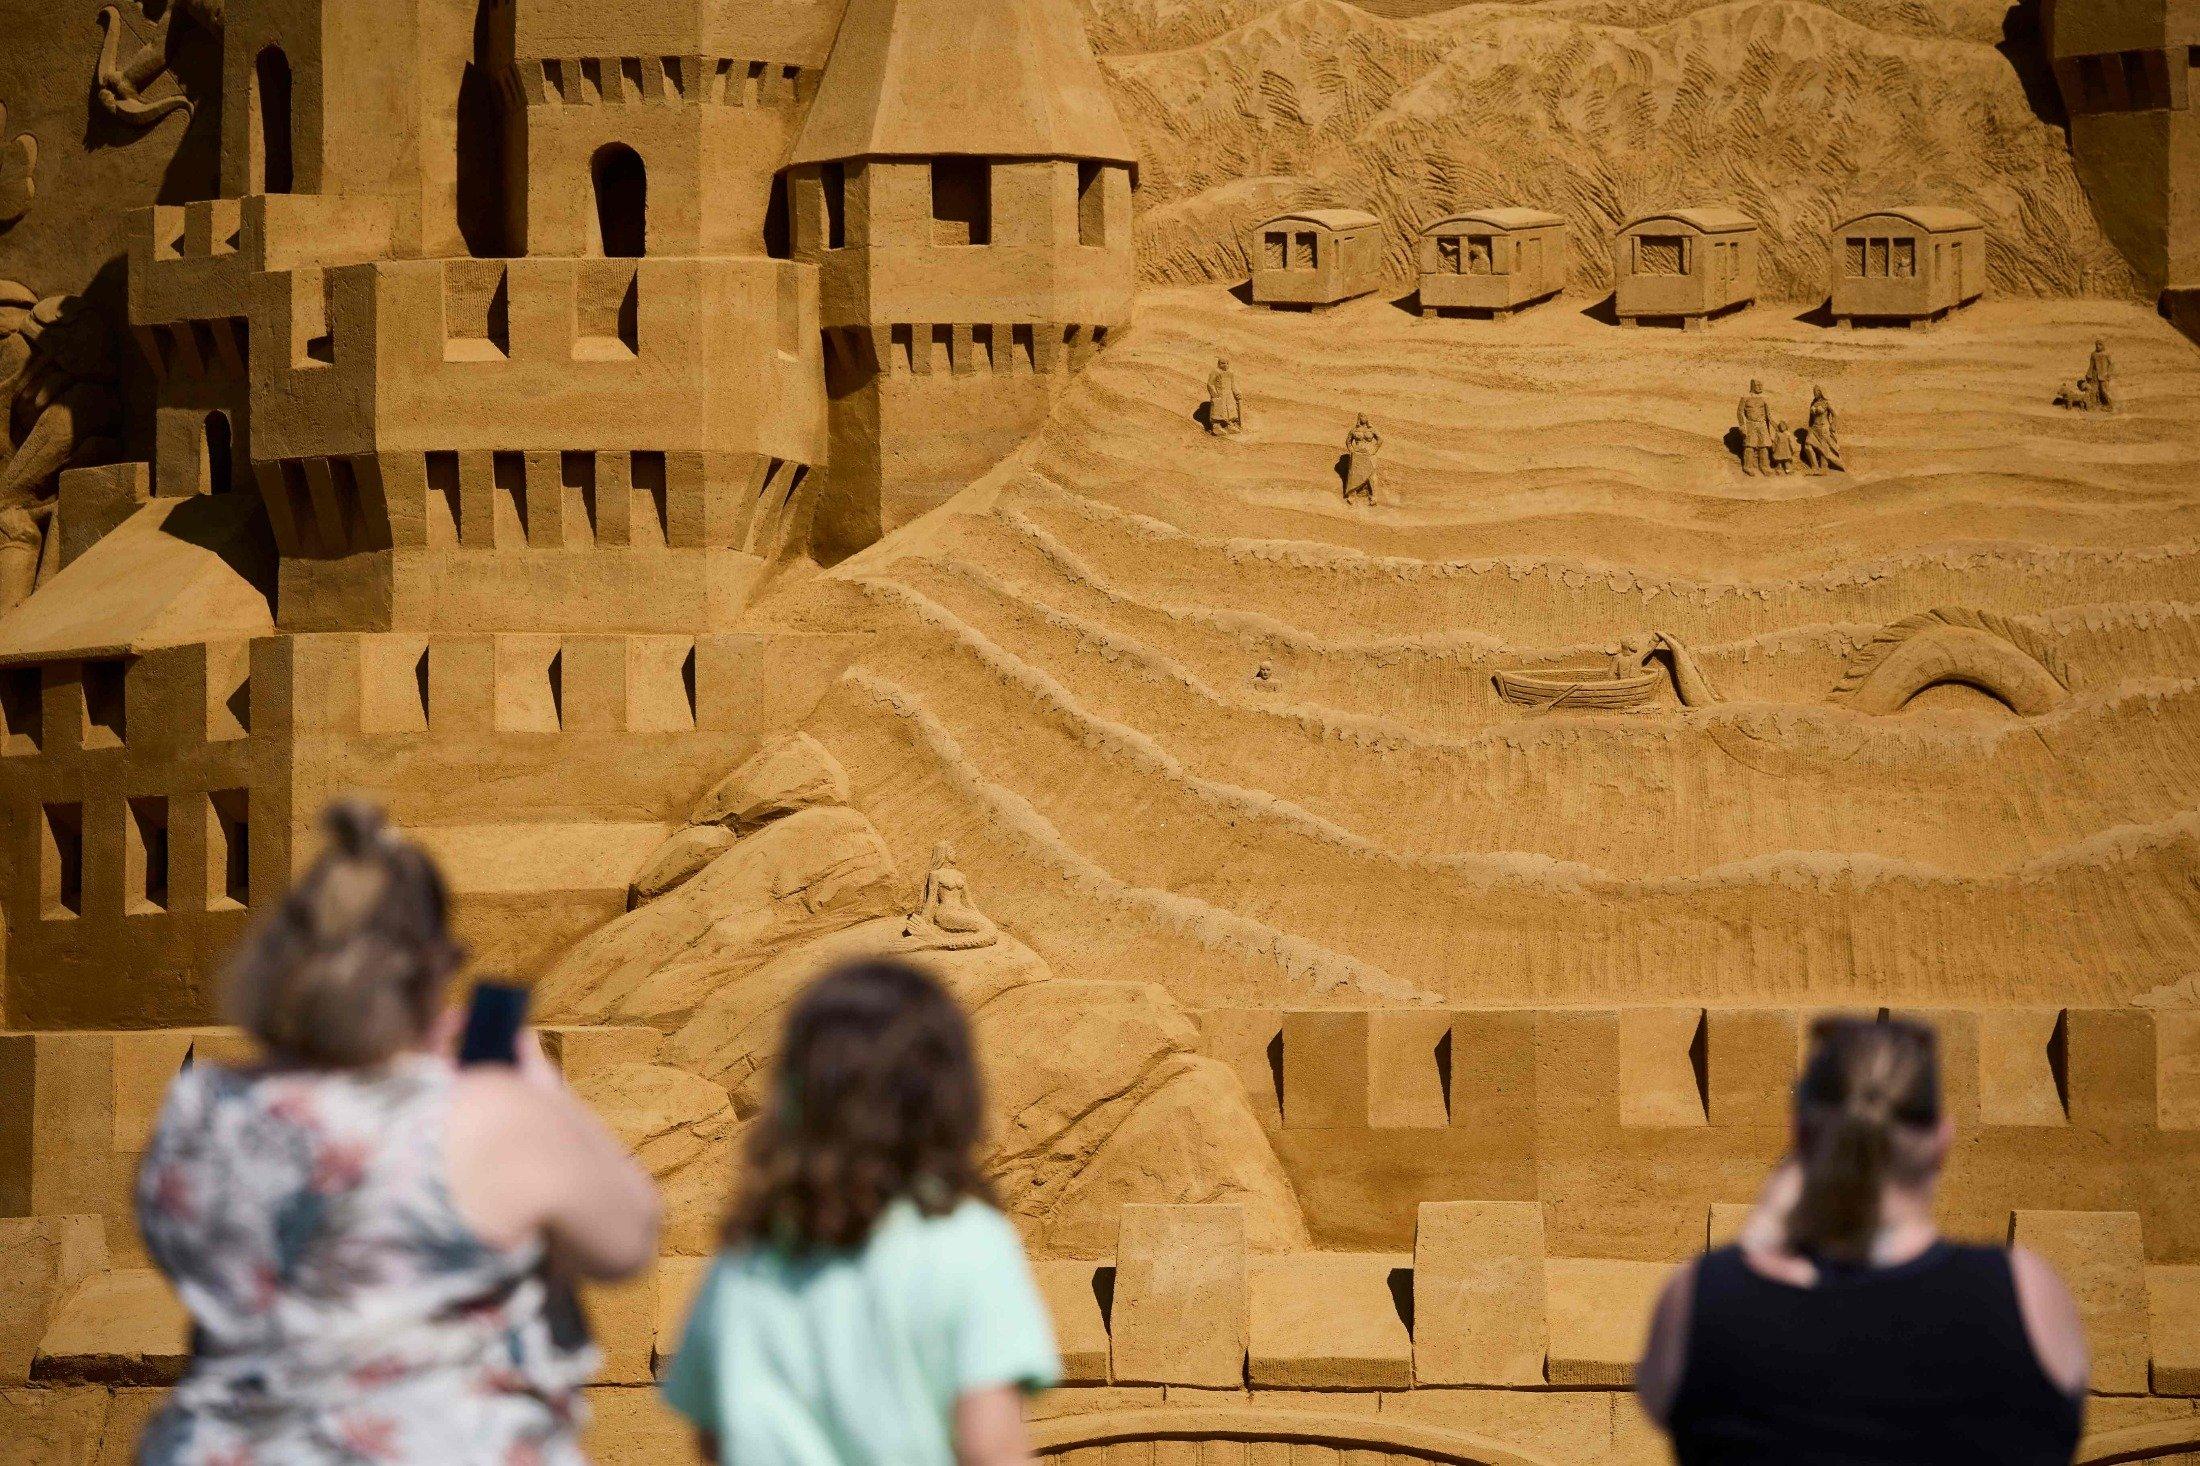 People visit the world's tallest sand sculpture, under construction in Blokhus, Denmark, July 7, 2021. (AFP Photo)